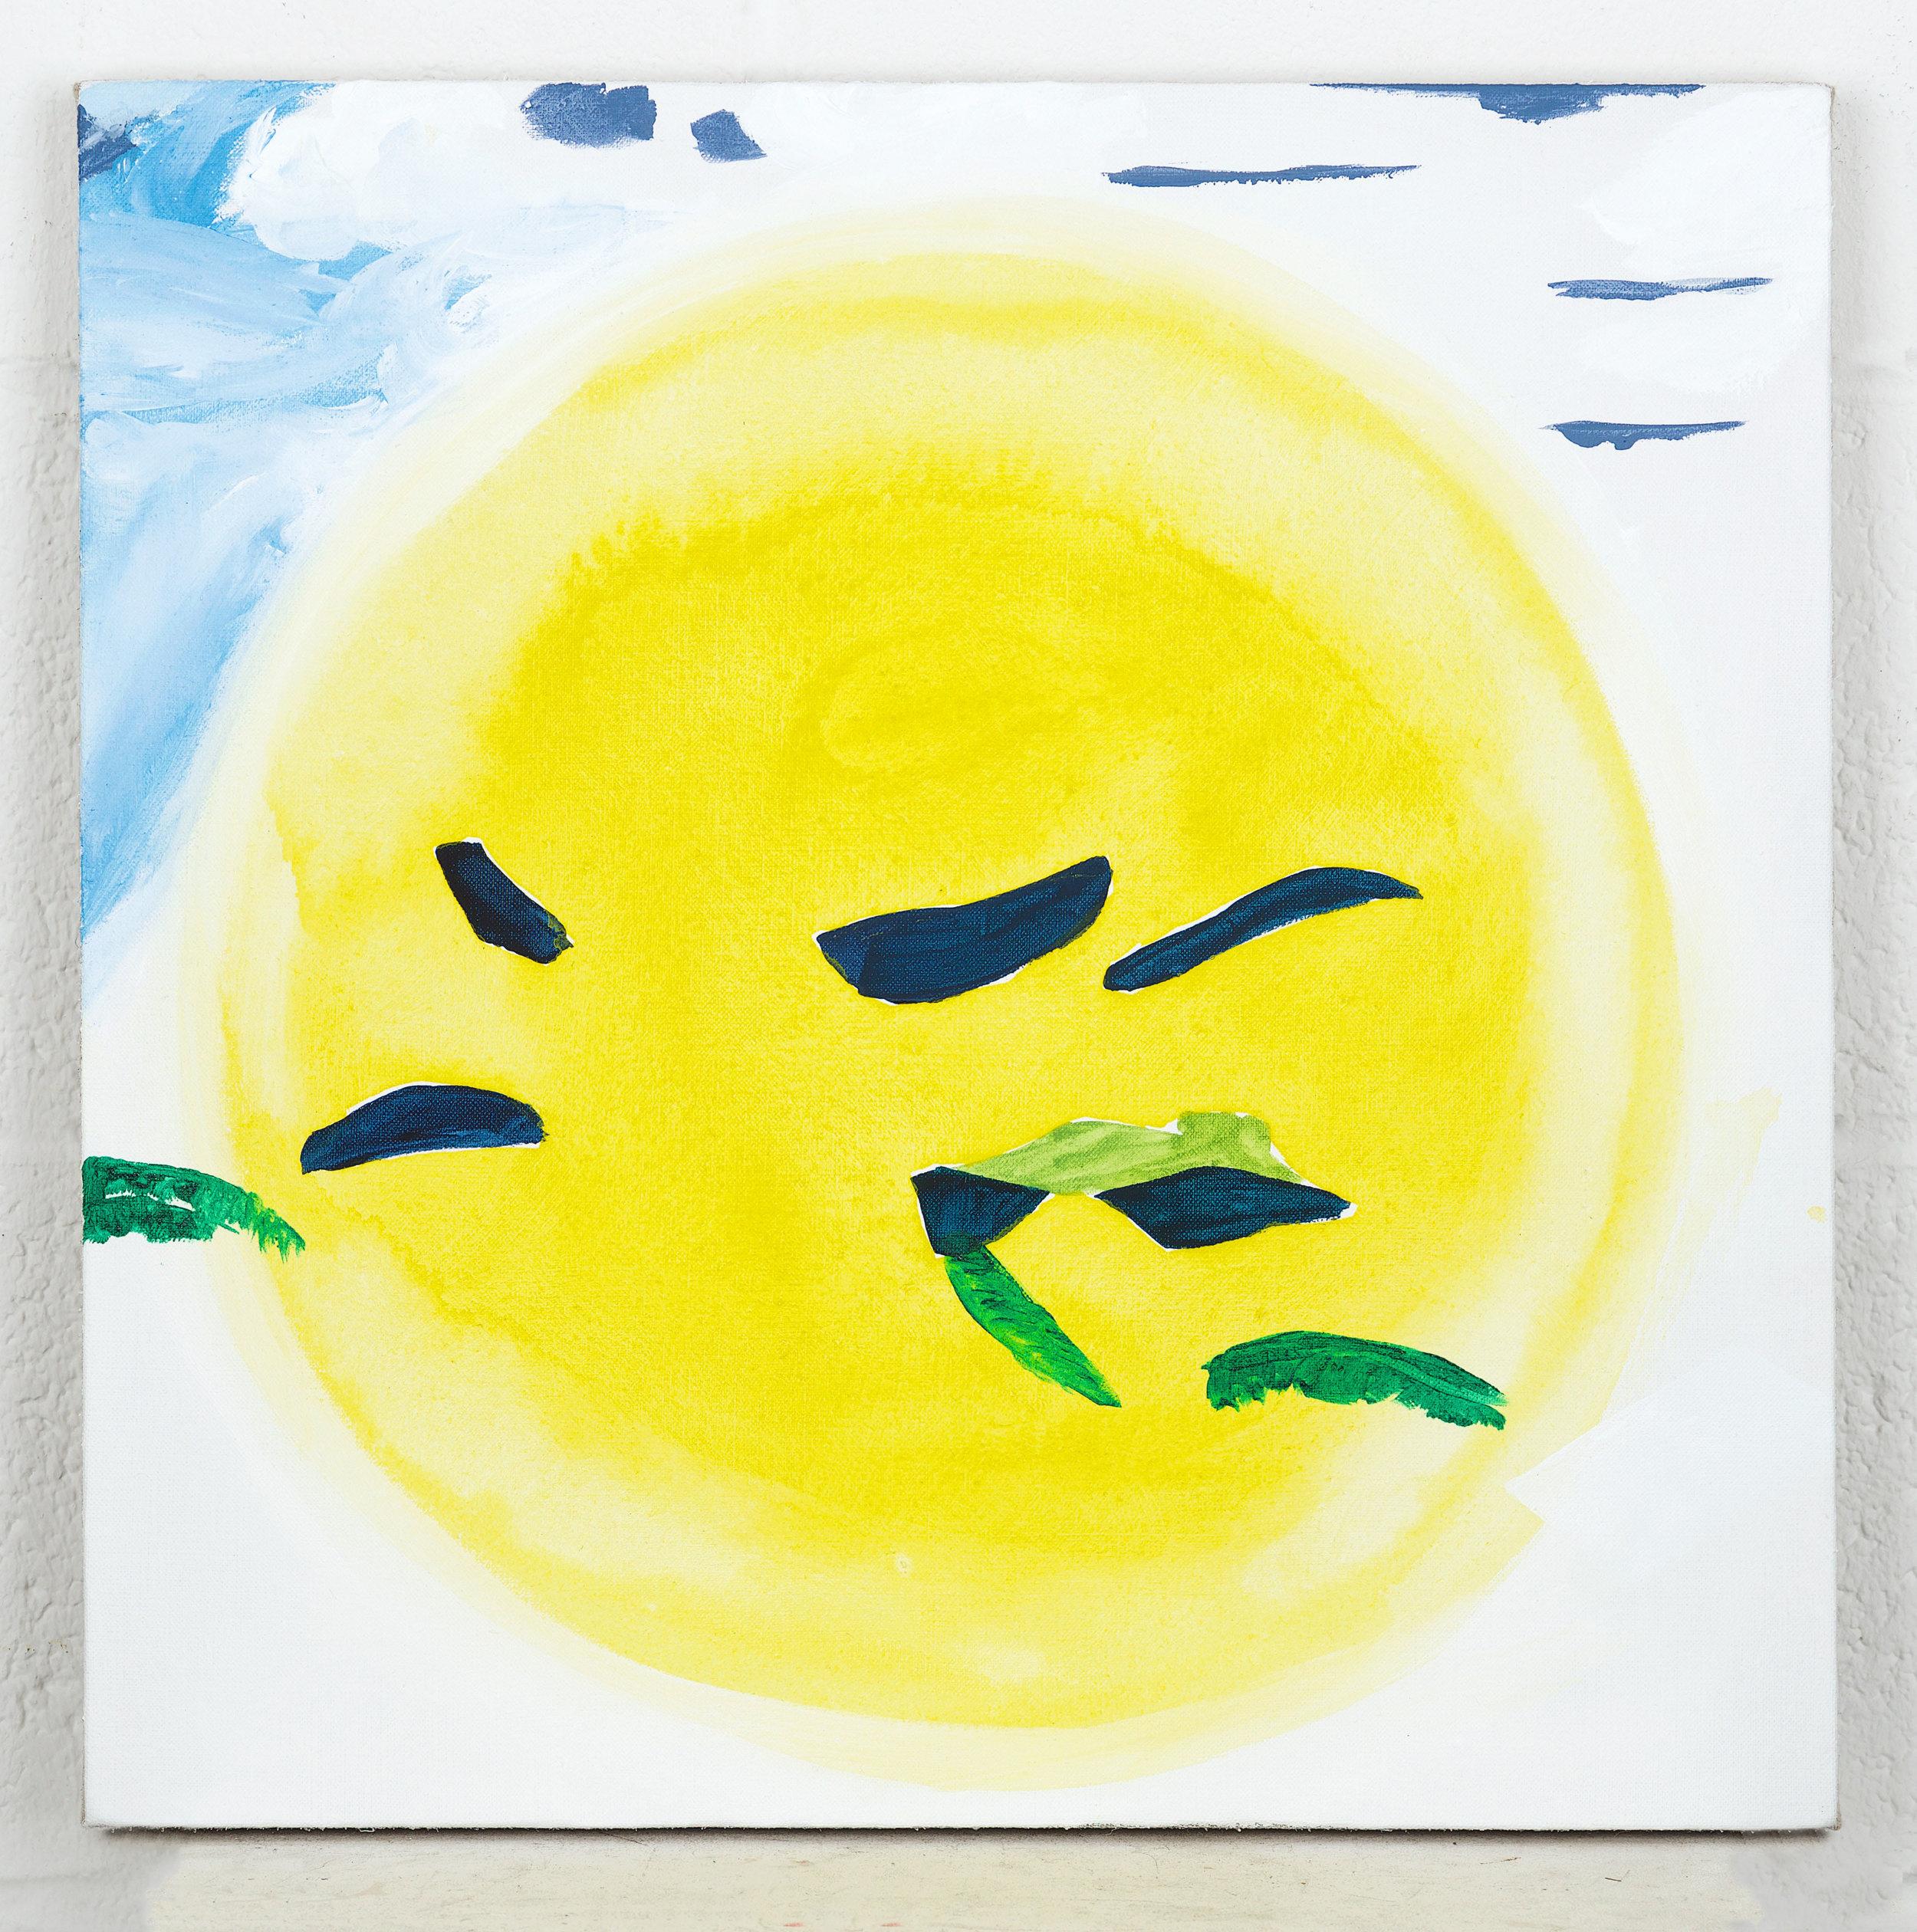 Untitled (Yellow bubble), 2018